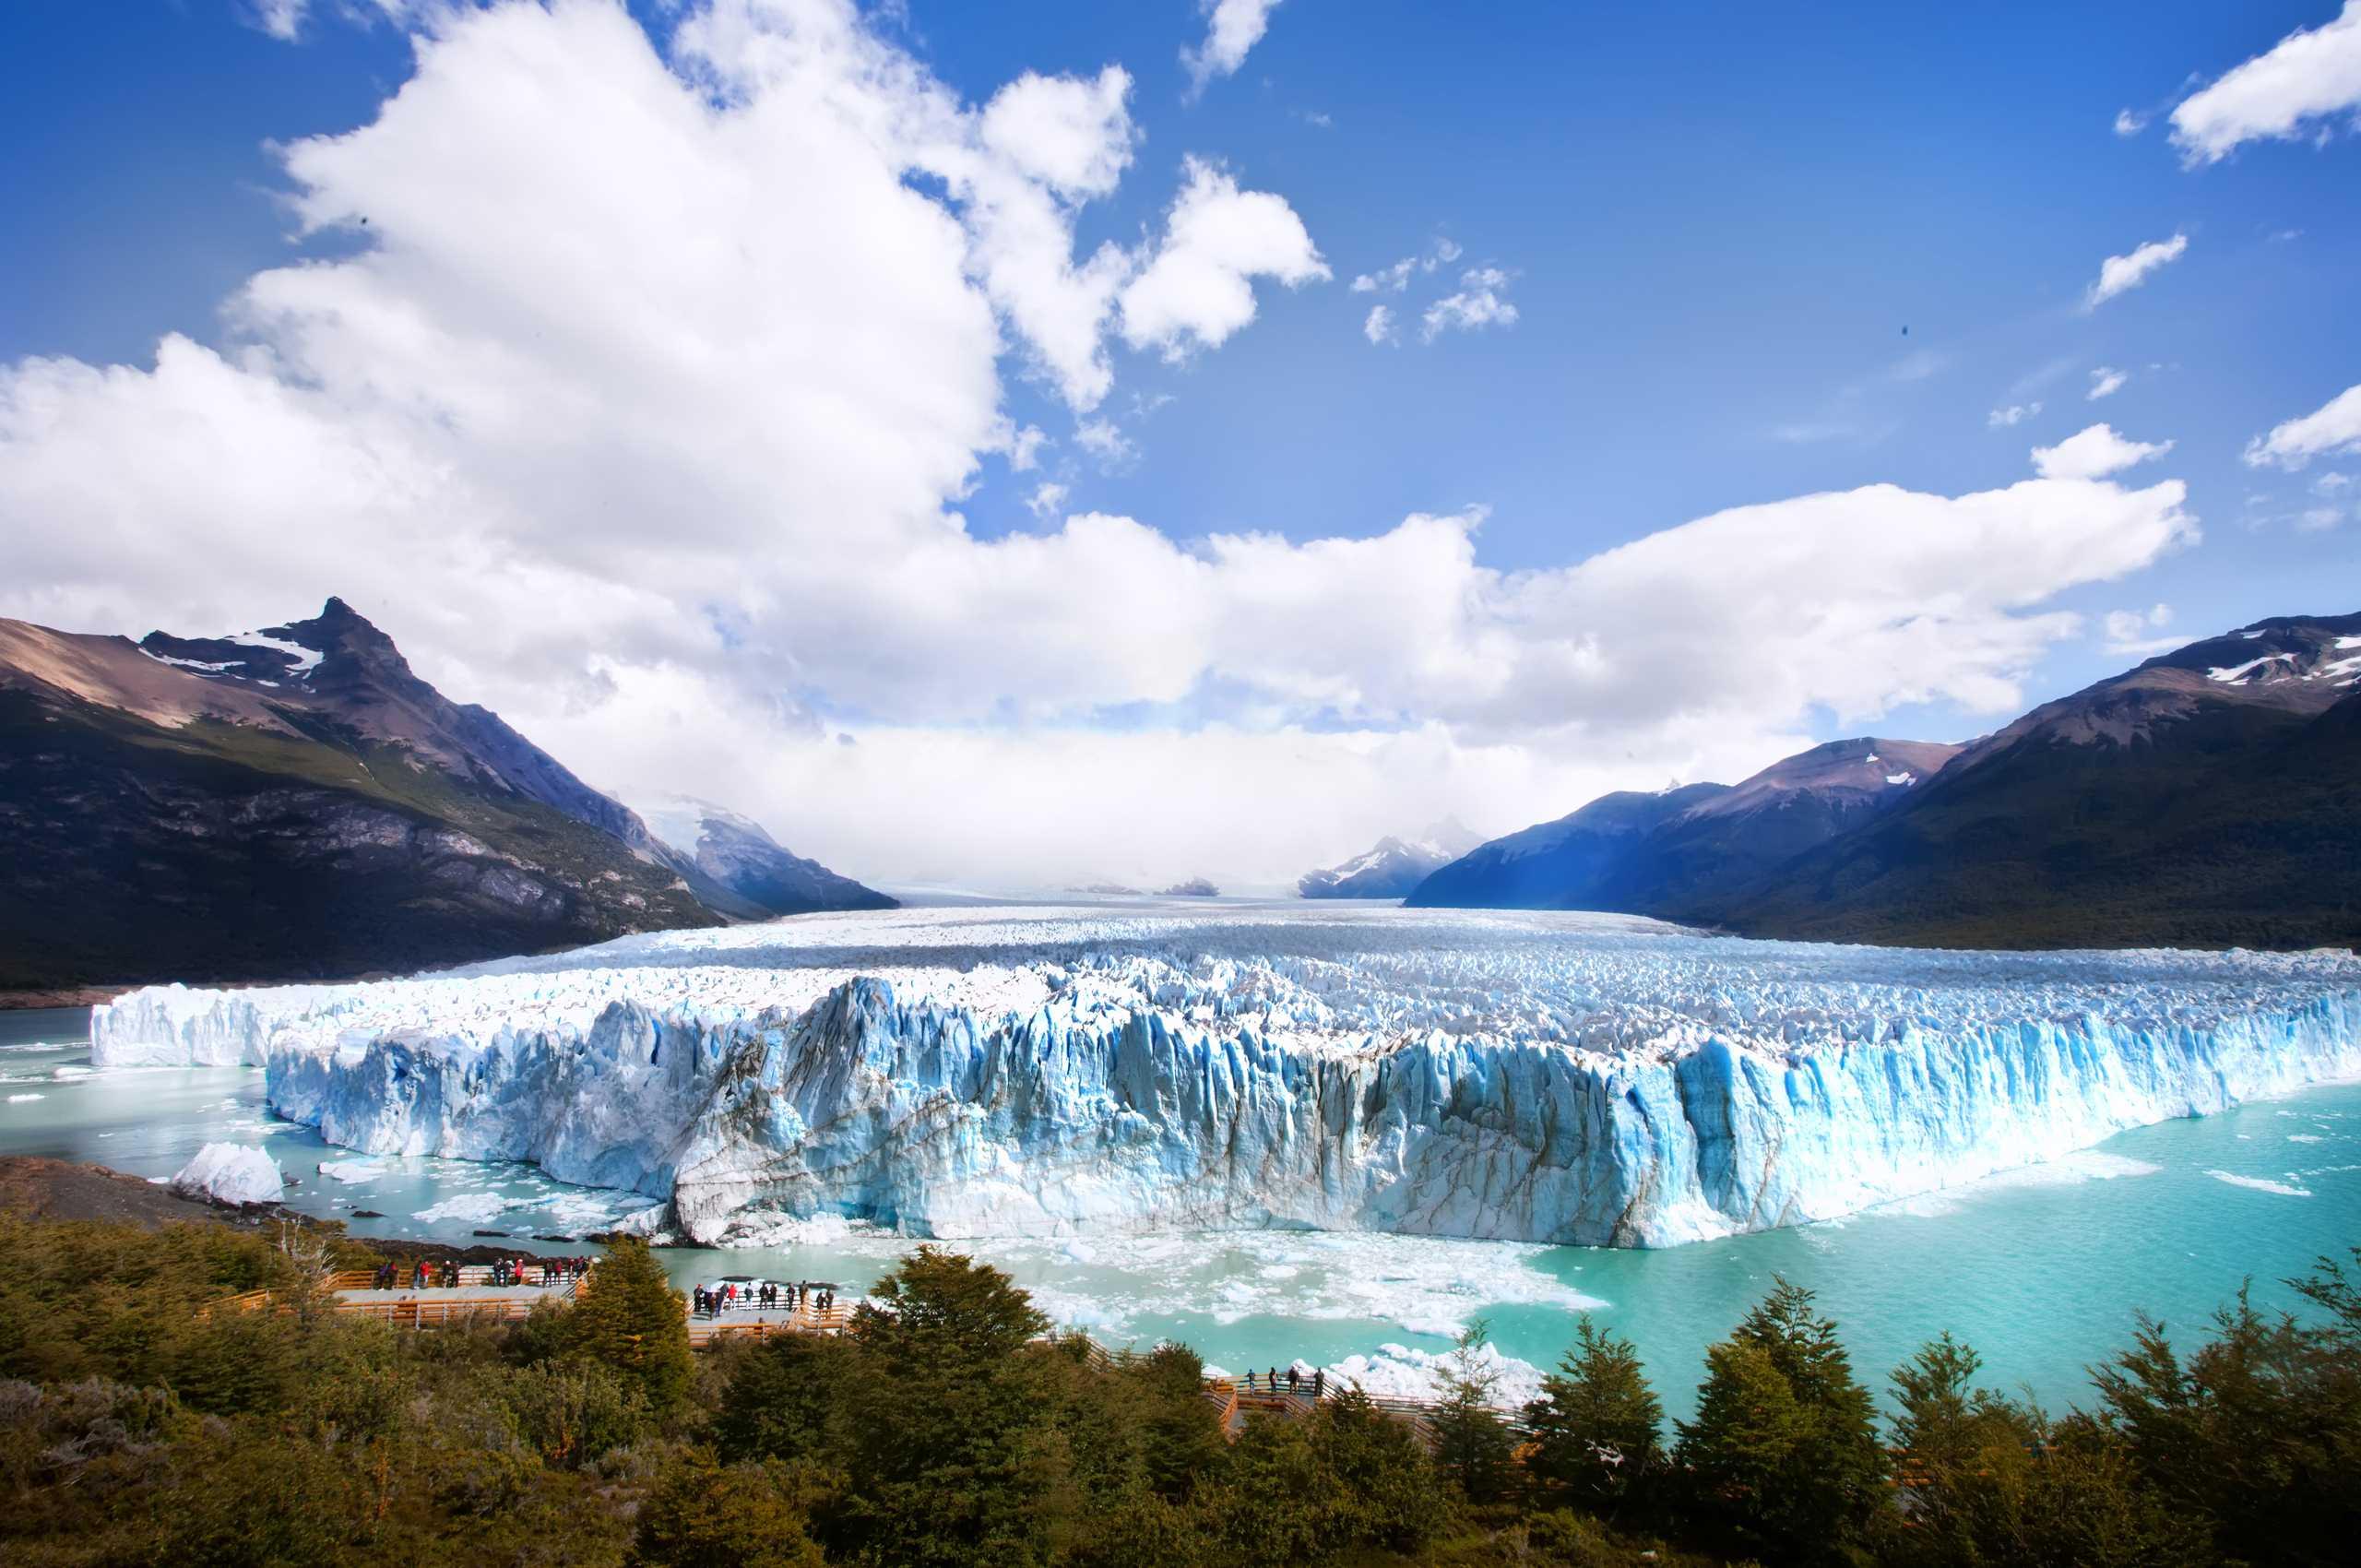 usa glacier park glacier park montana national park park wallpaper 2560x1700